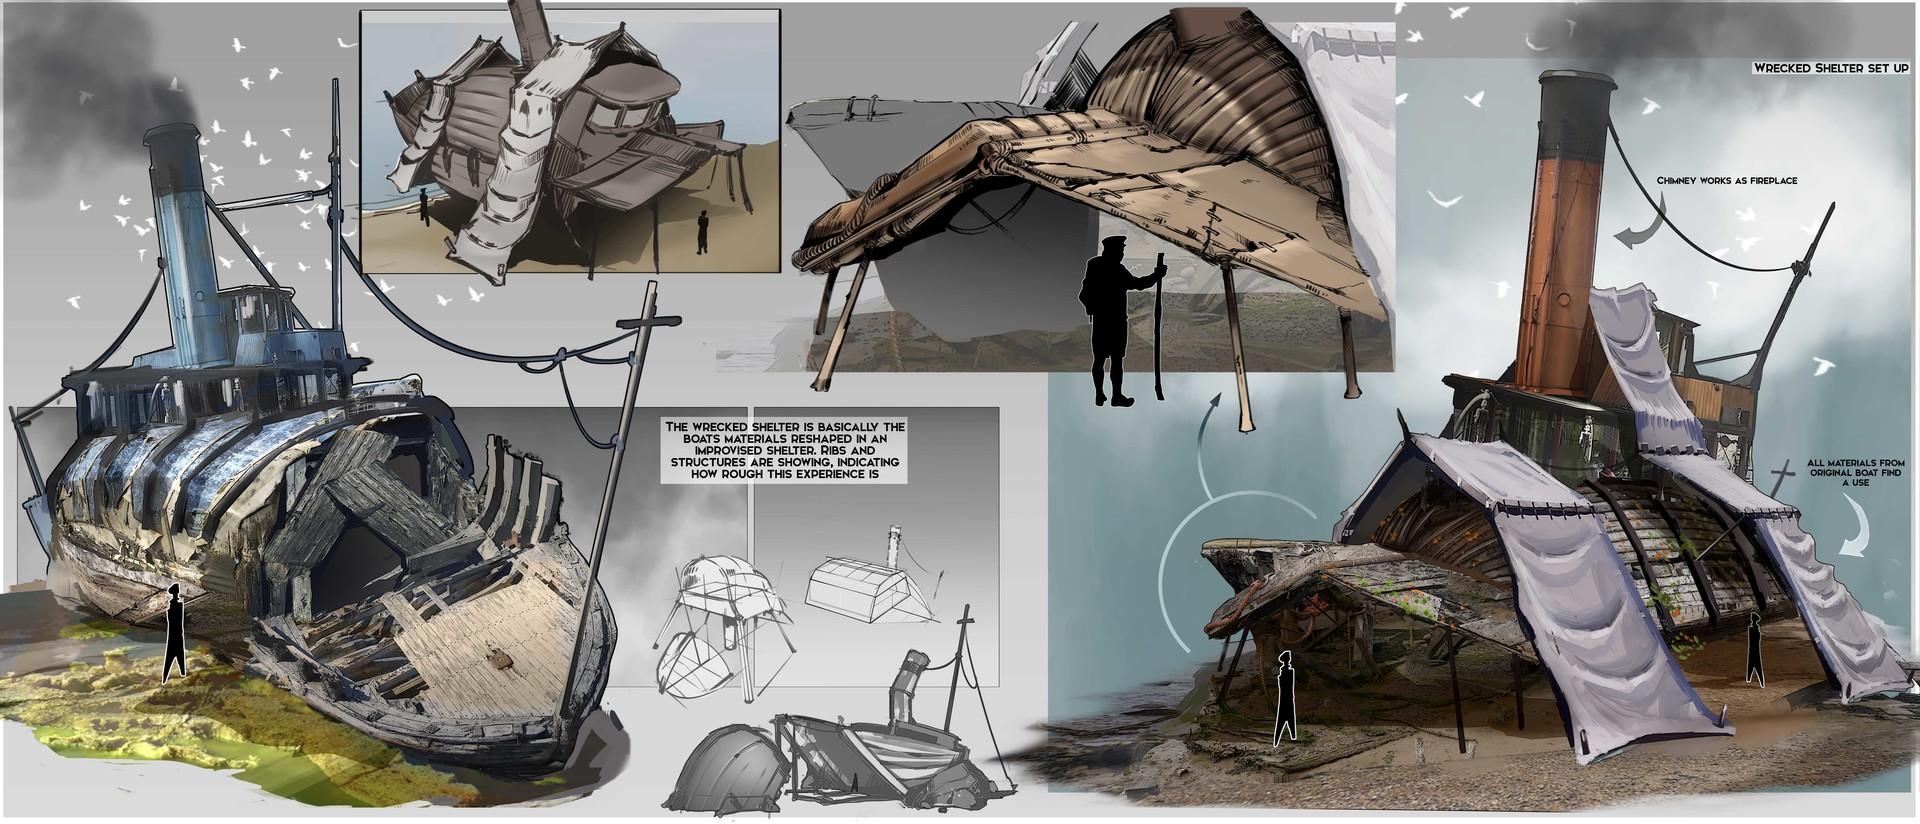 Imagini pentru Improvised Boat Shelter